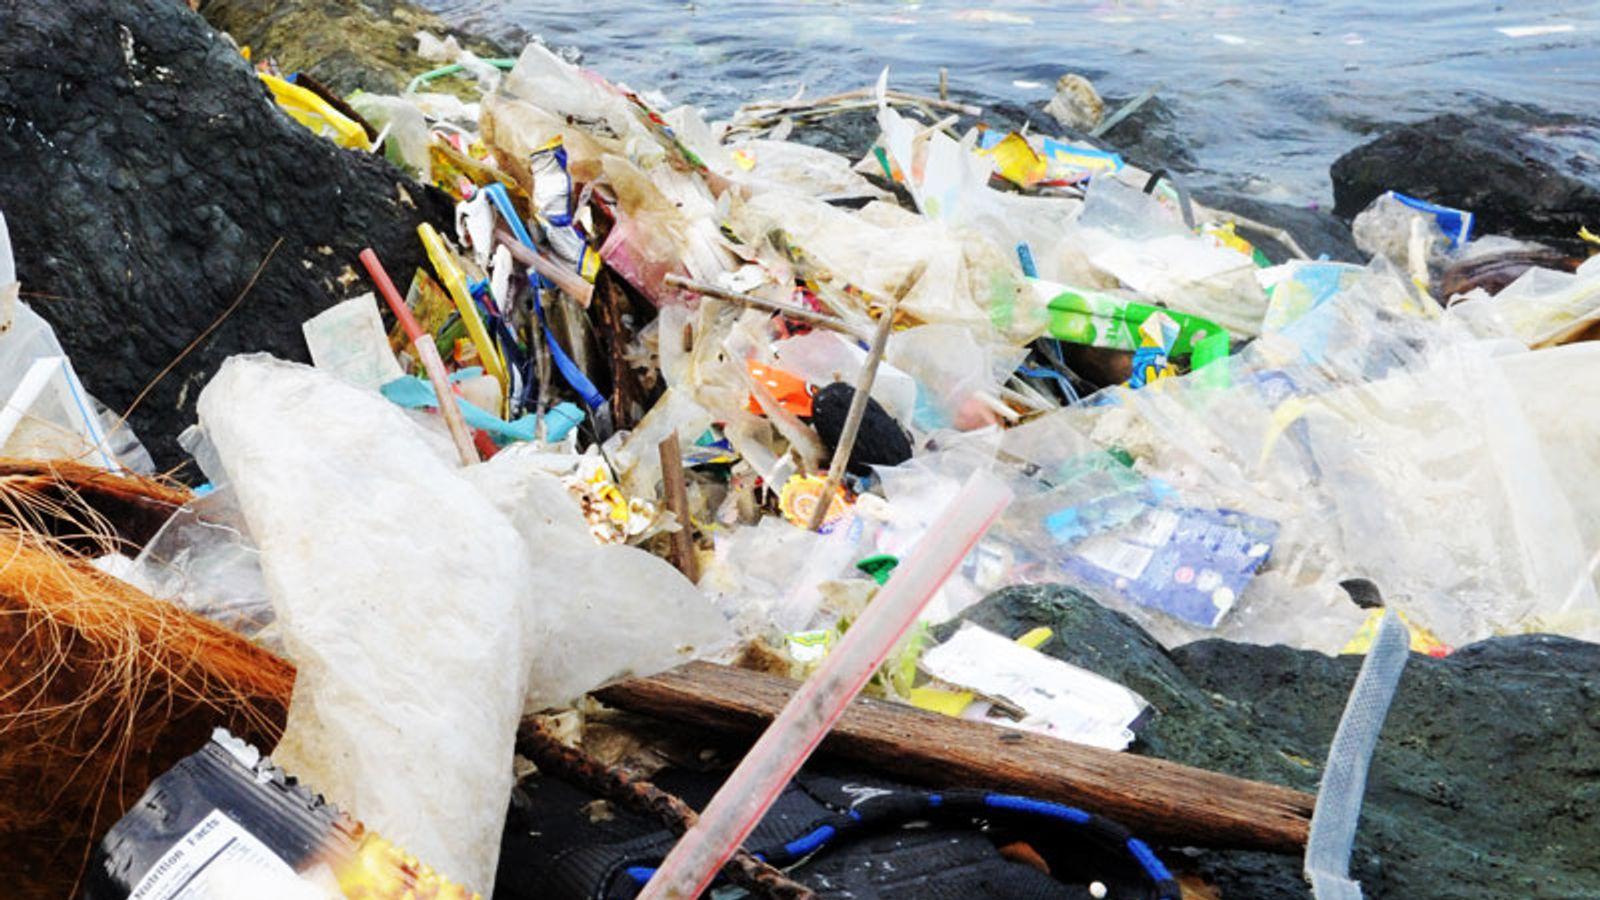 Plastic rubbish piles up on the coastline.